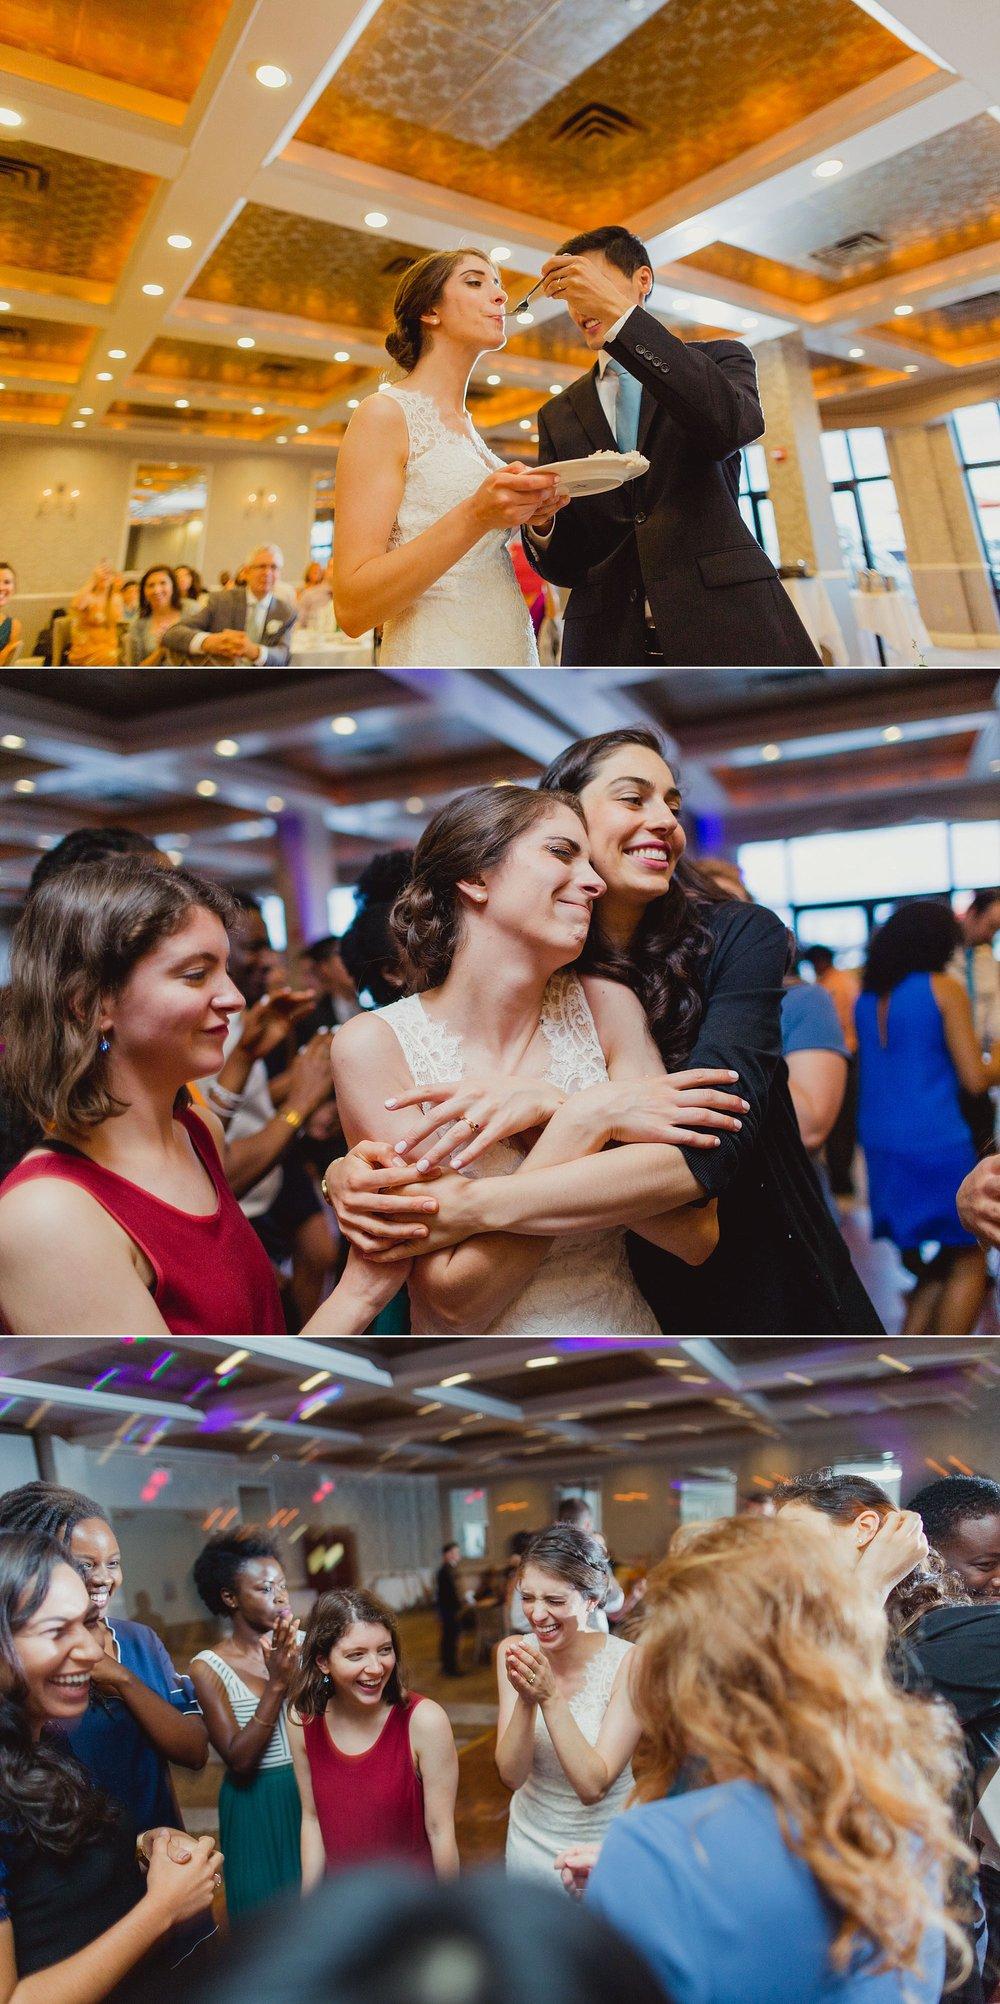 Venezia wedding Boston-95.jpg